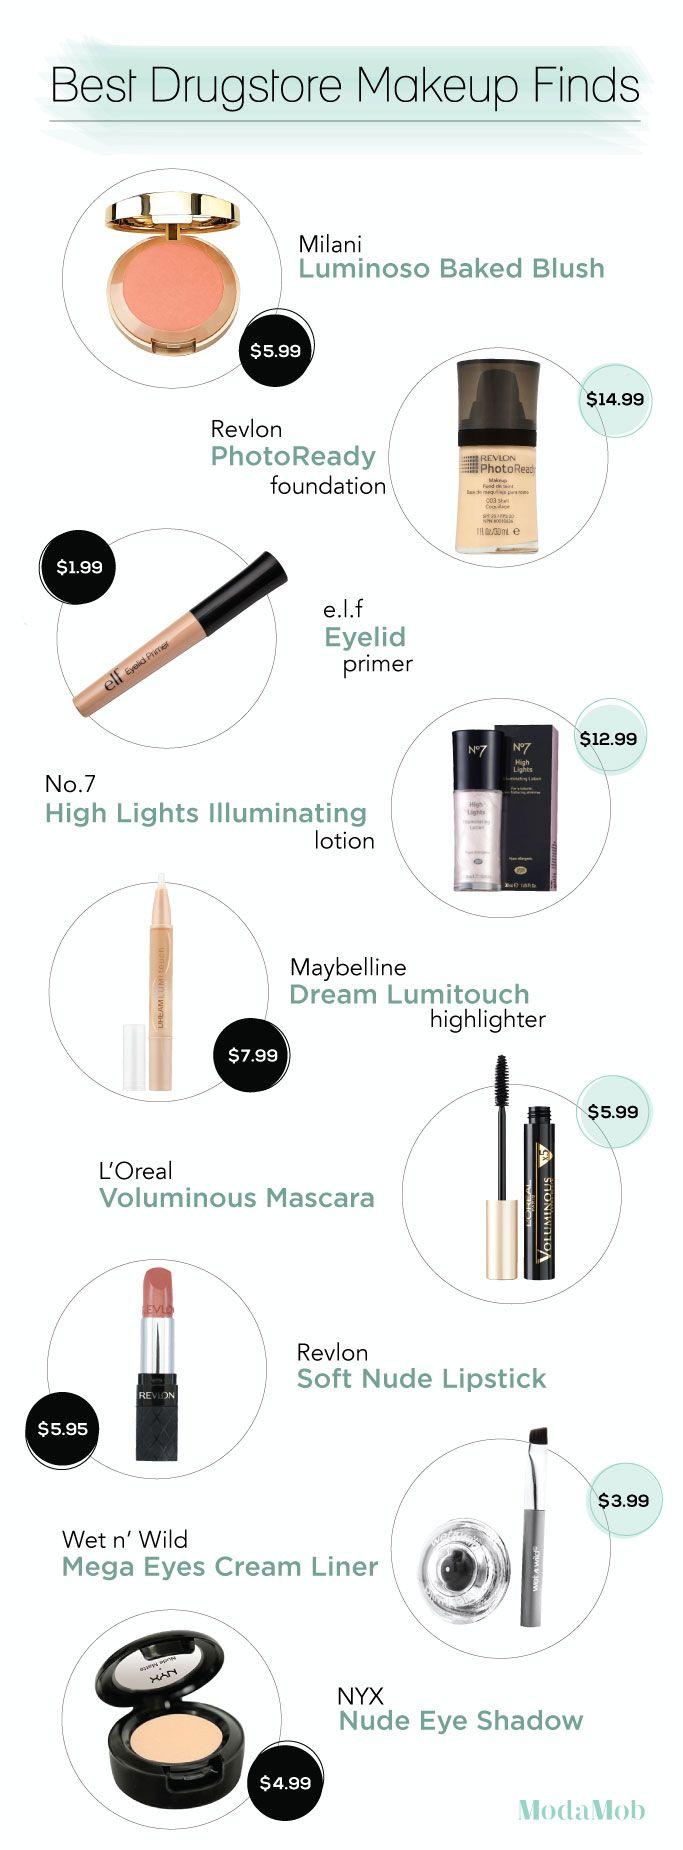 Best Drugstore Makeup Milani Luminoso Baked Blush